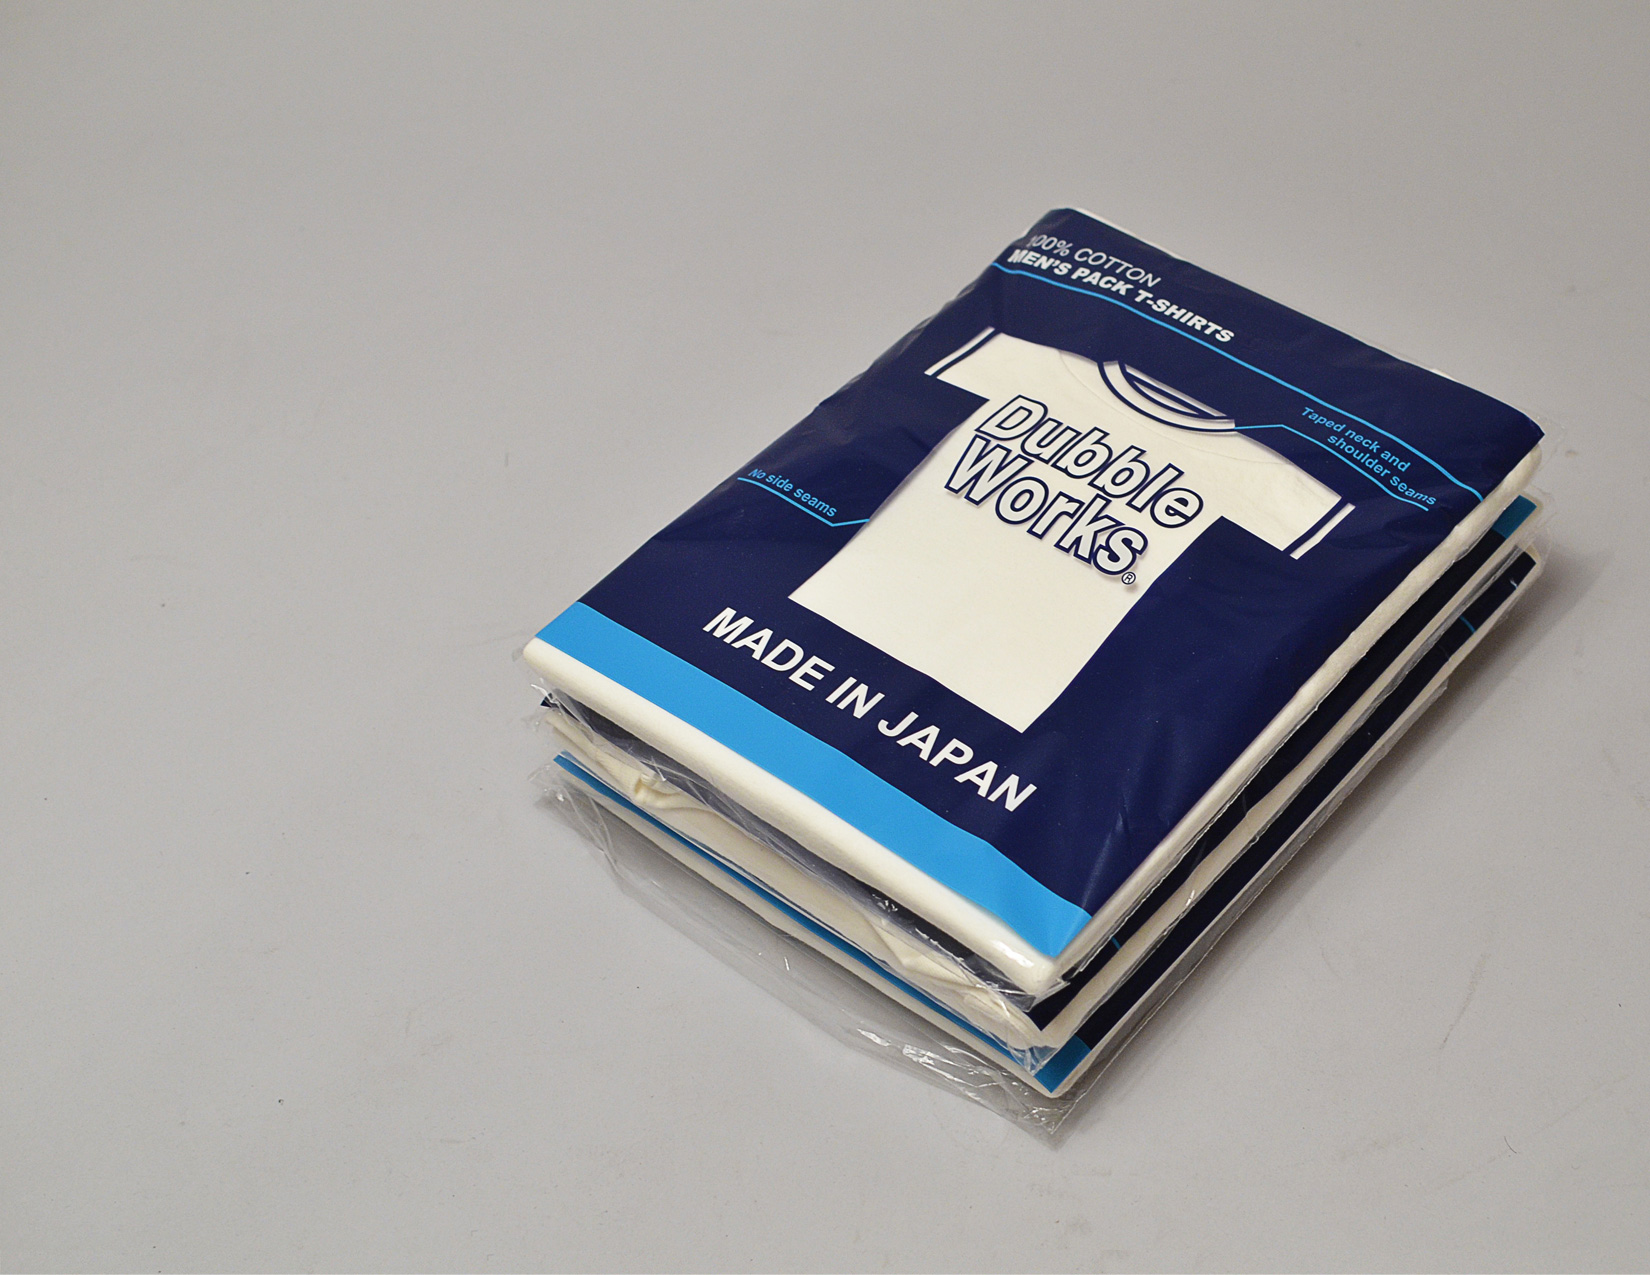 Dubbleworks-FW17-Lookbook_Page_5.jpg